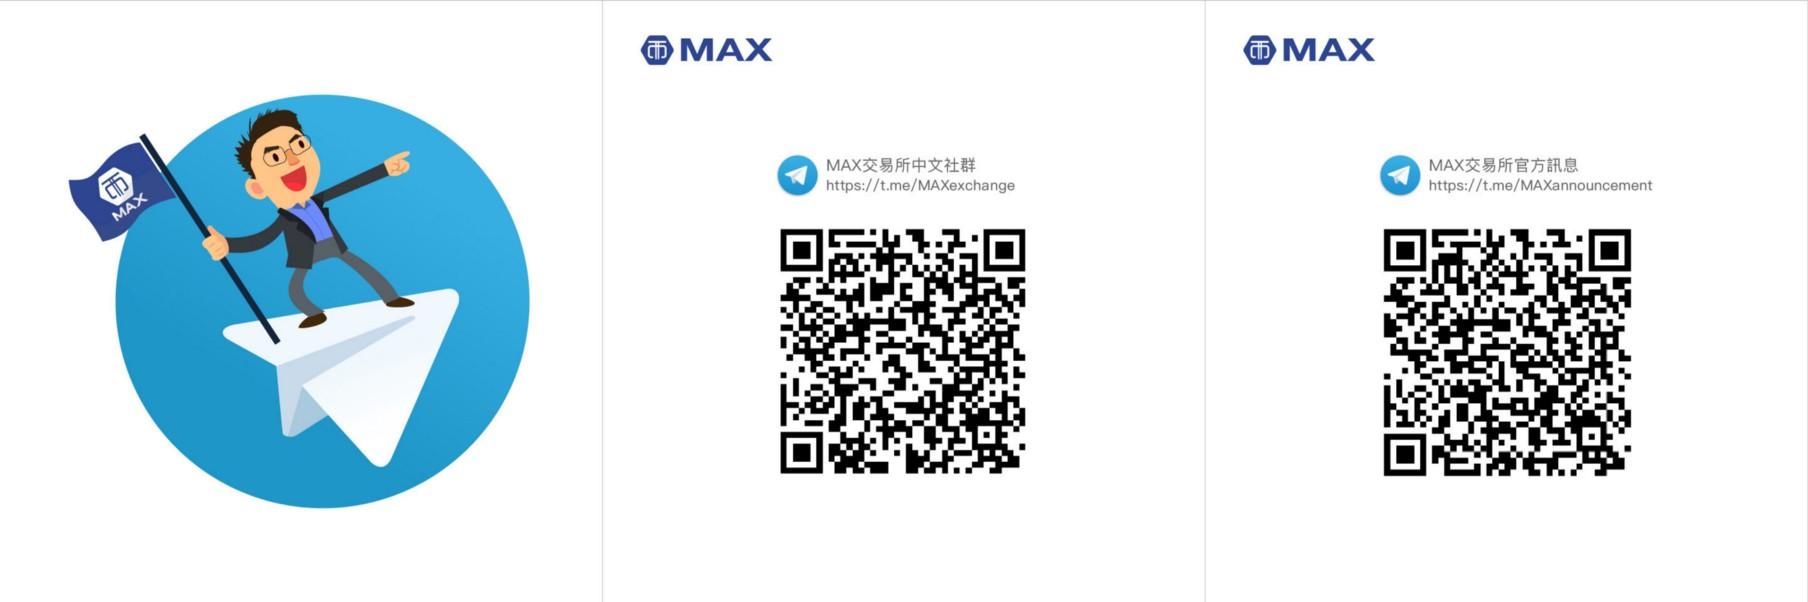 MAX社群